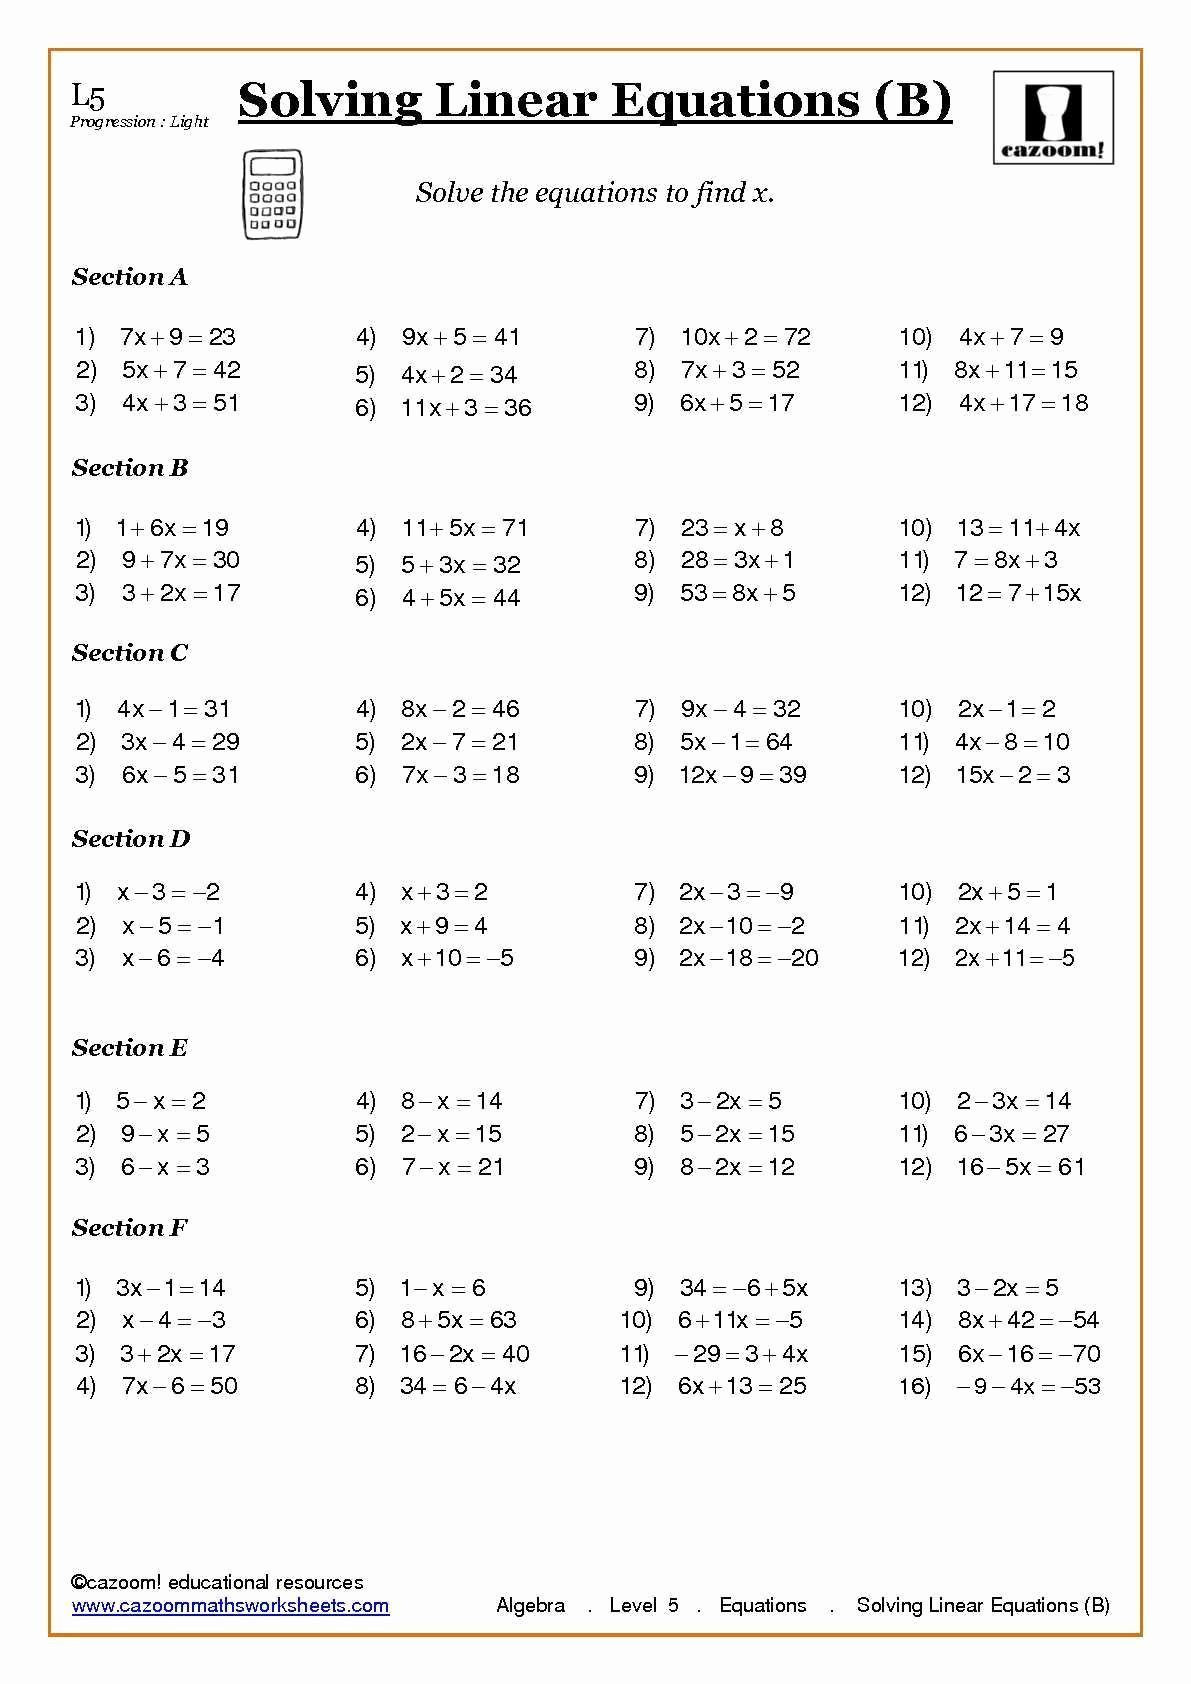 Algebra Word Problems Worksheet Pdf 3 Year 7 Algebra Worksheets Word Problems Worksheet Best